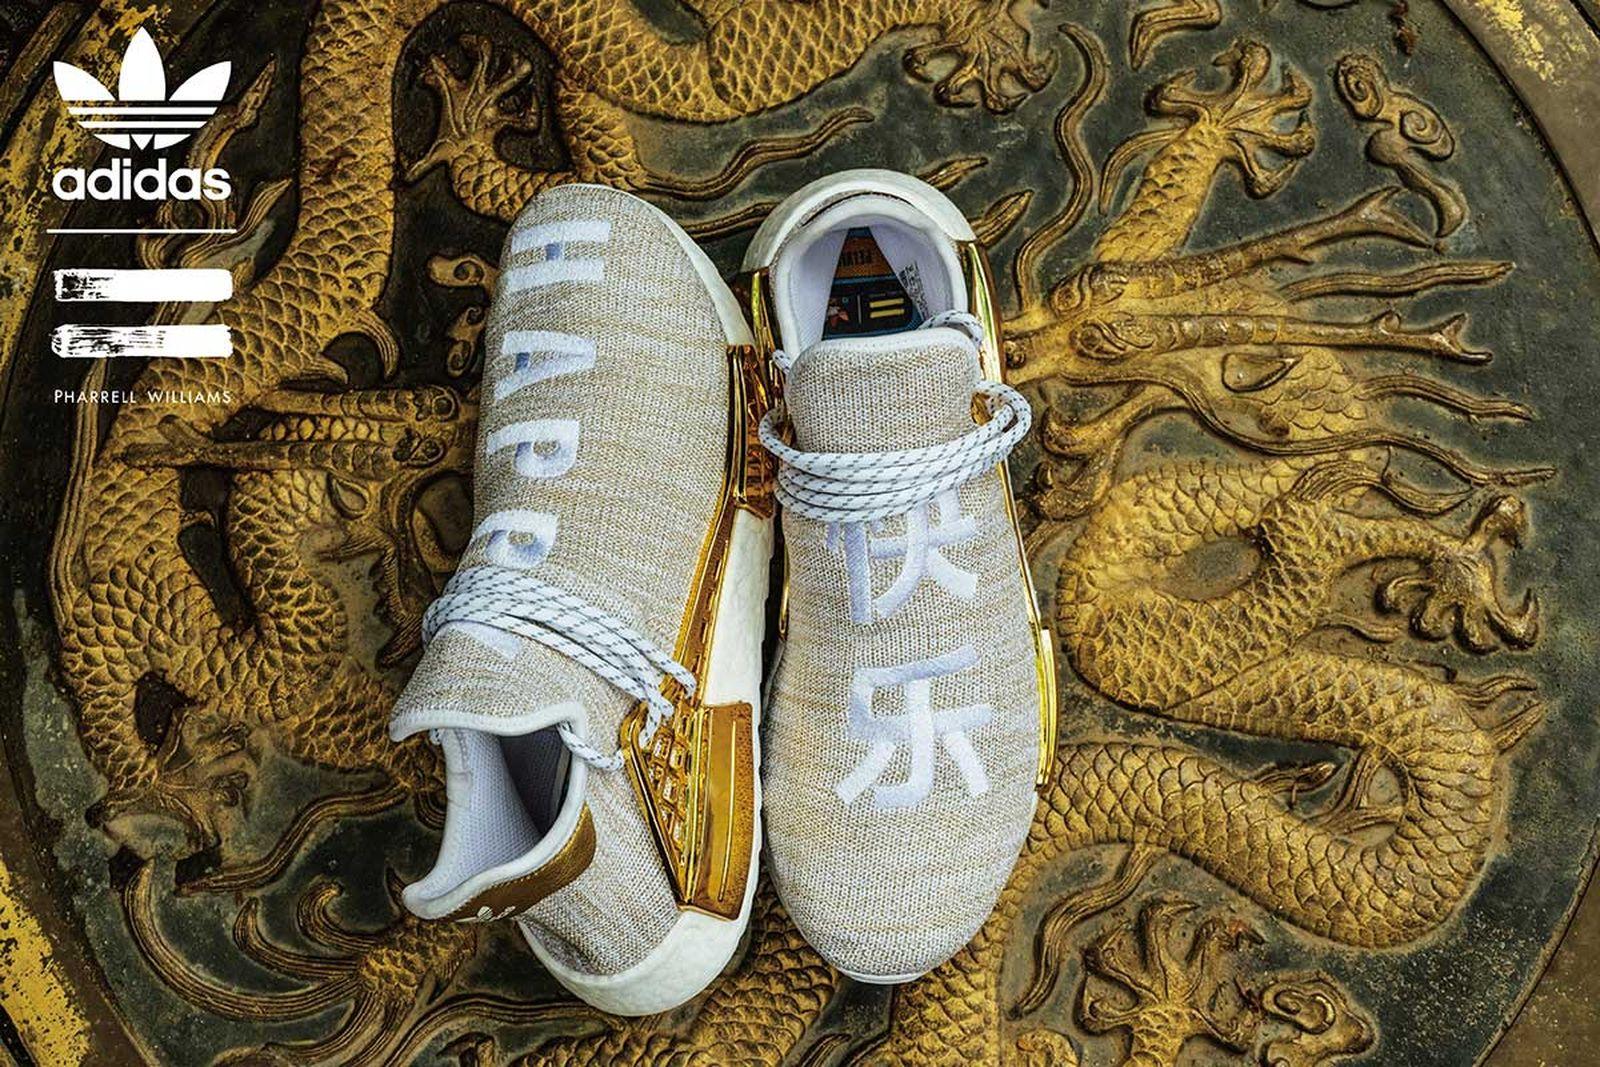 adidas-pharrell-williams-hu-nmd-china-release-price-02